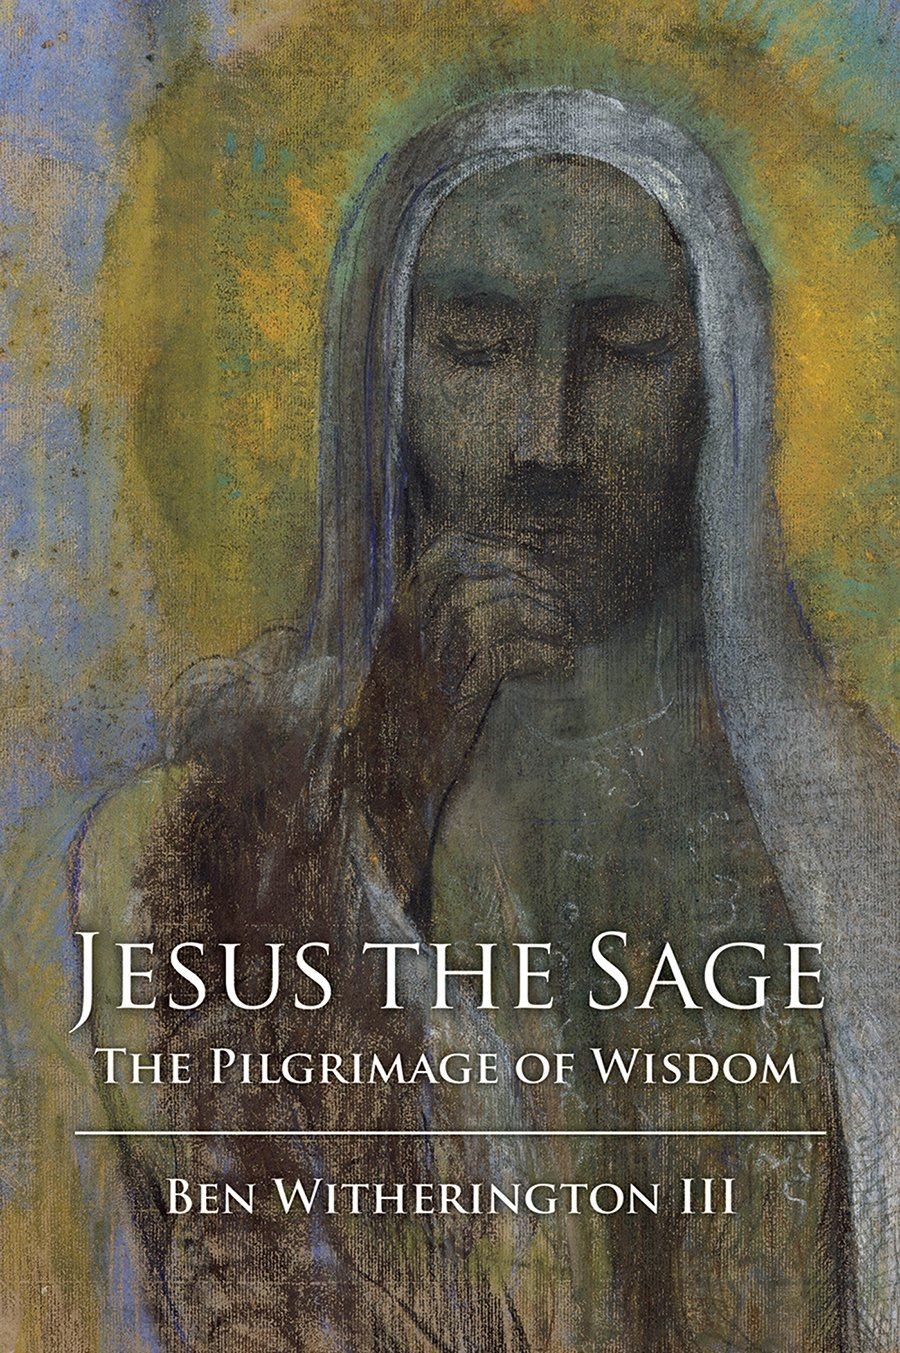 Jesus the Sage: The Pilgrimage of Wisdom ebook